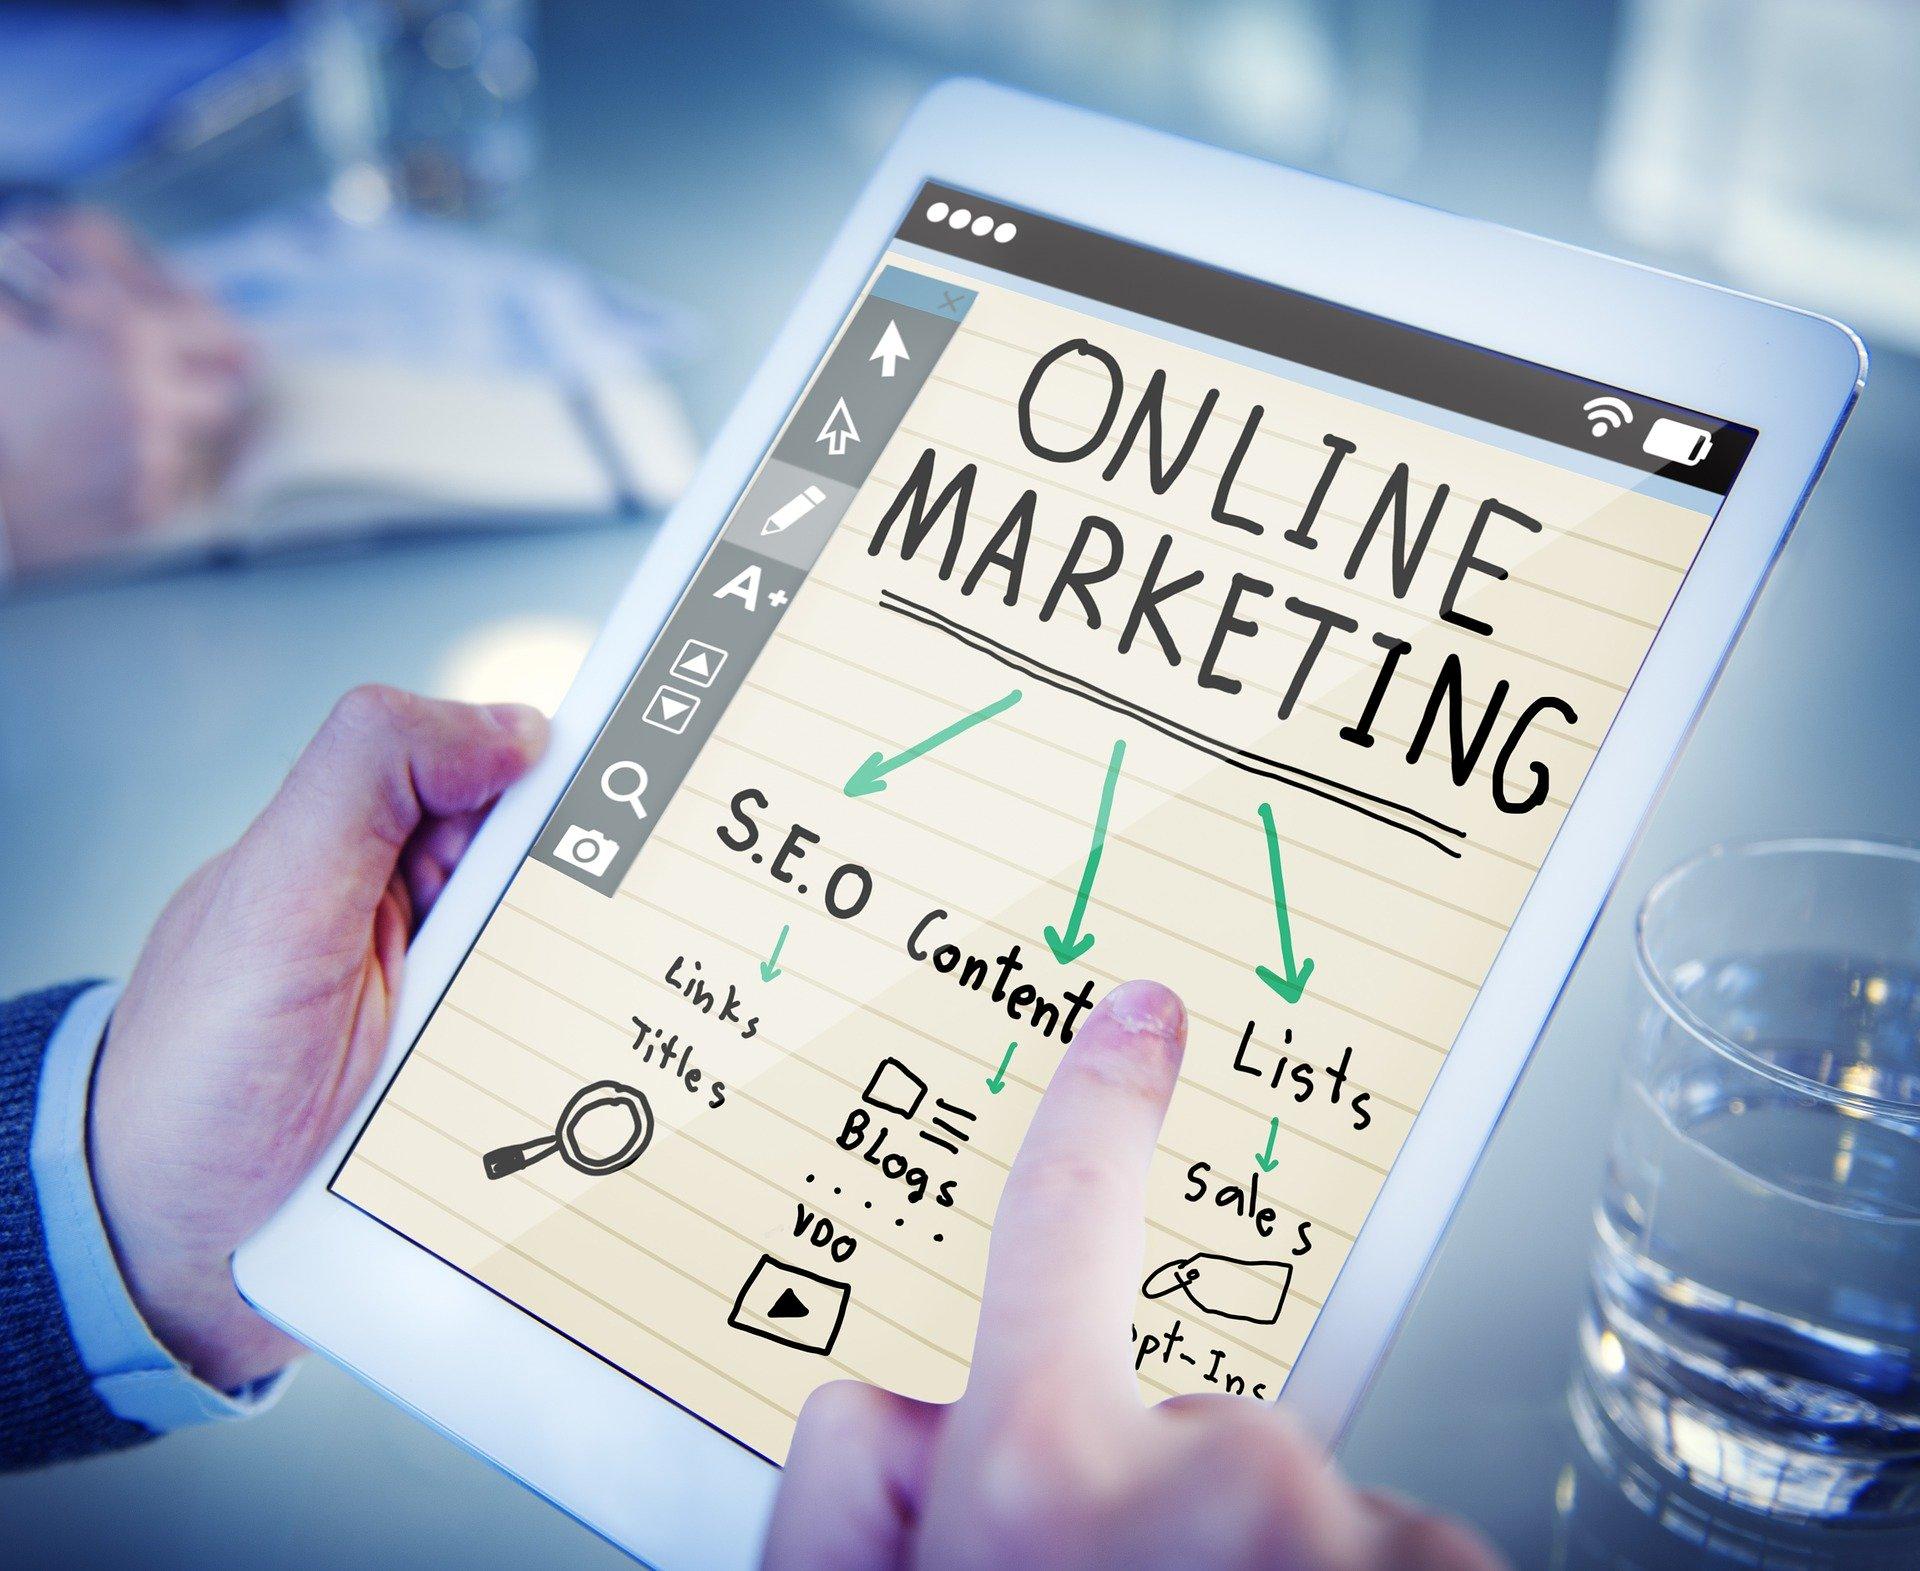 latest-digital-marketing-trends-digital-marketing-blog-oustource-digital-marketing-services